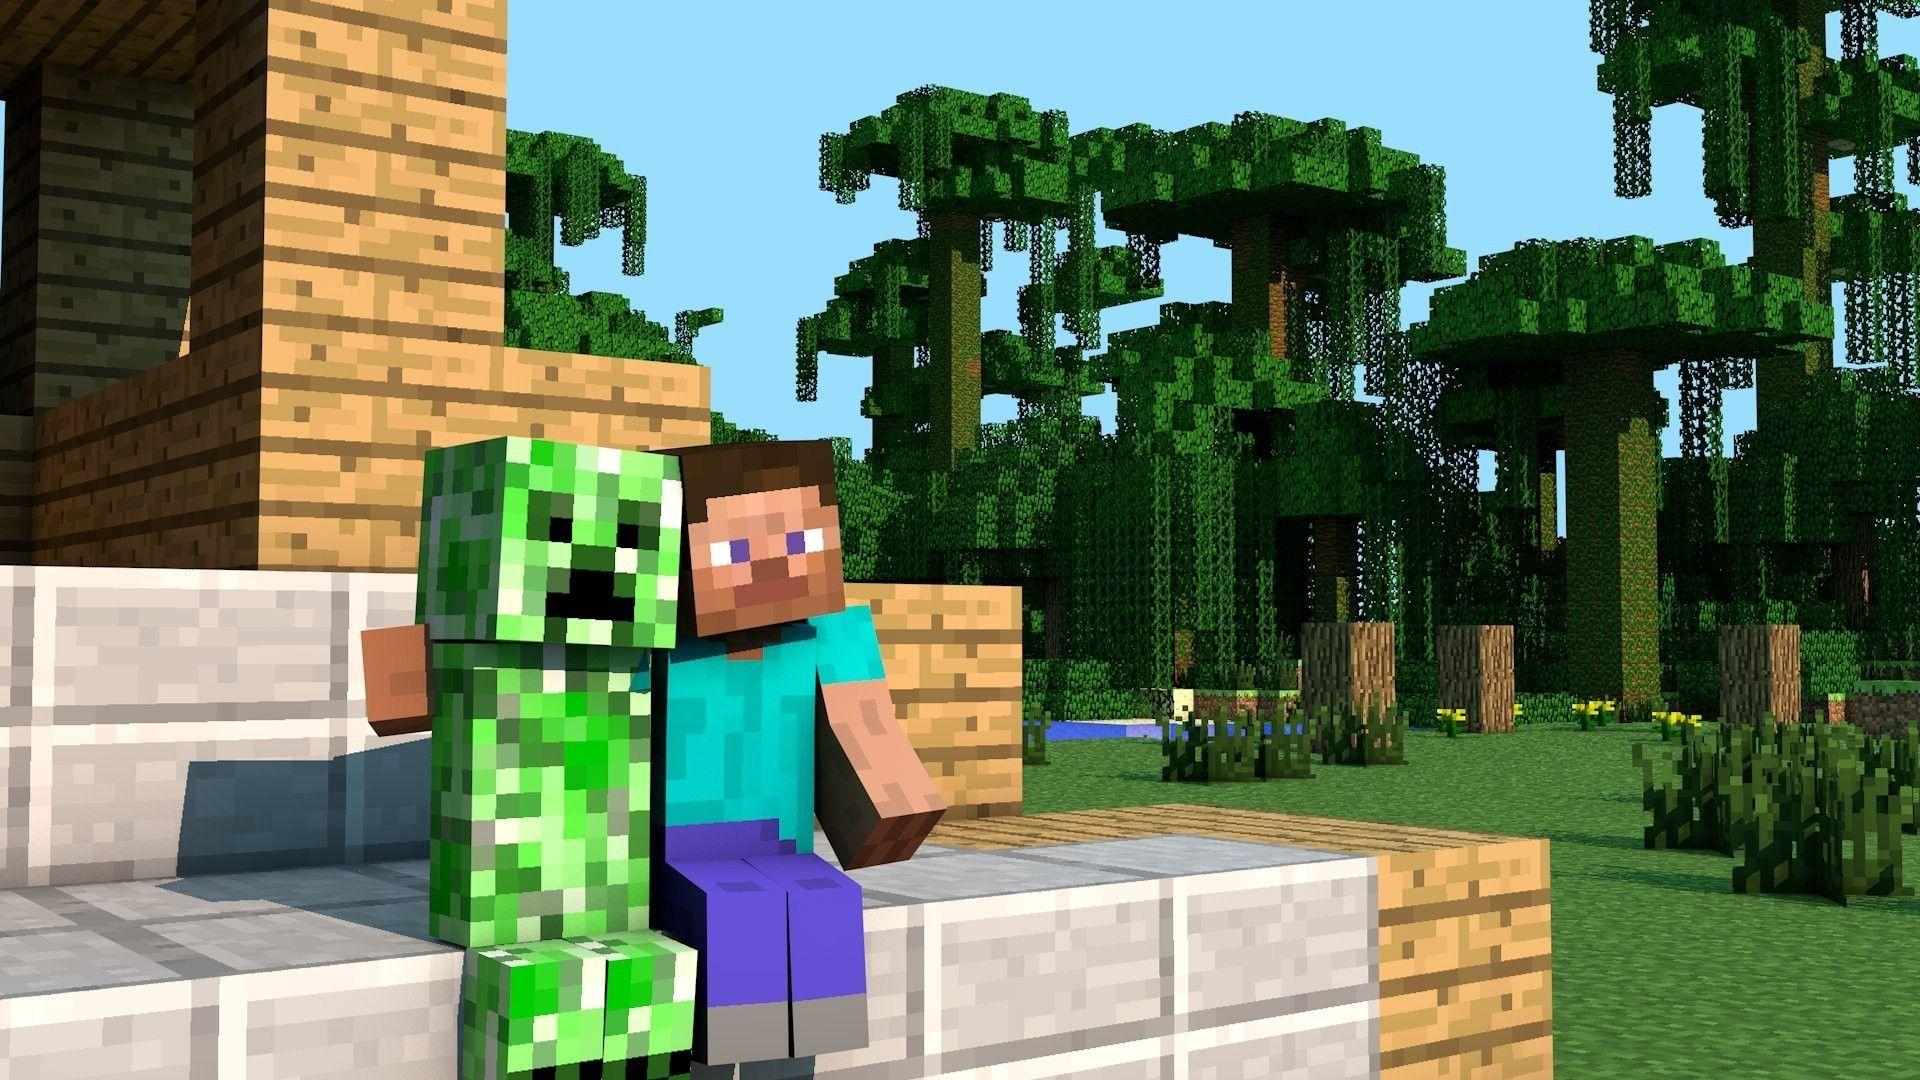 Creeper Steve Minecraft Background HD Wallpaper